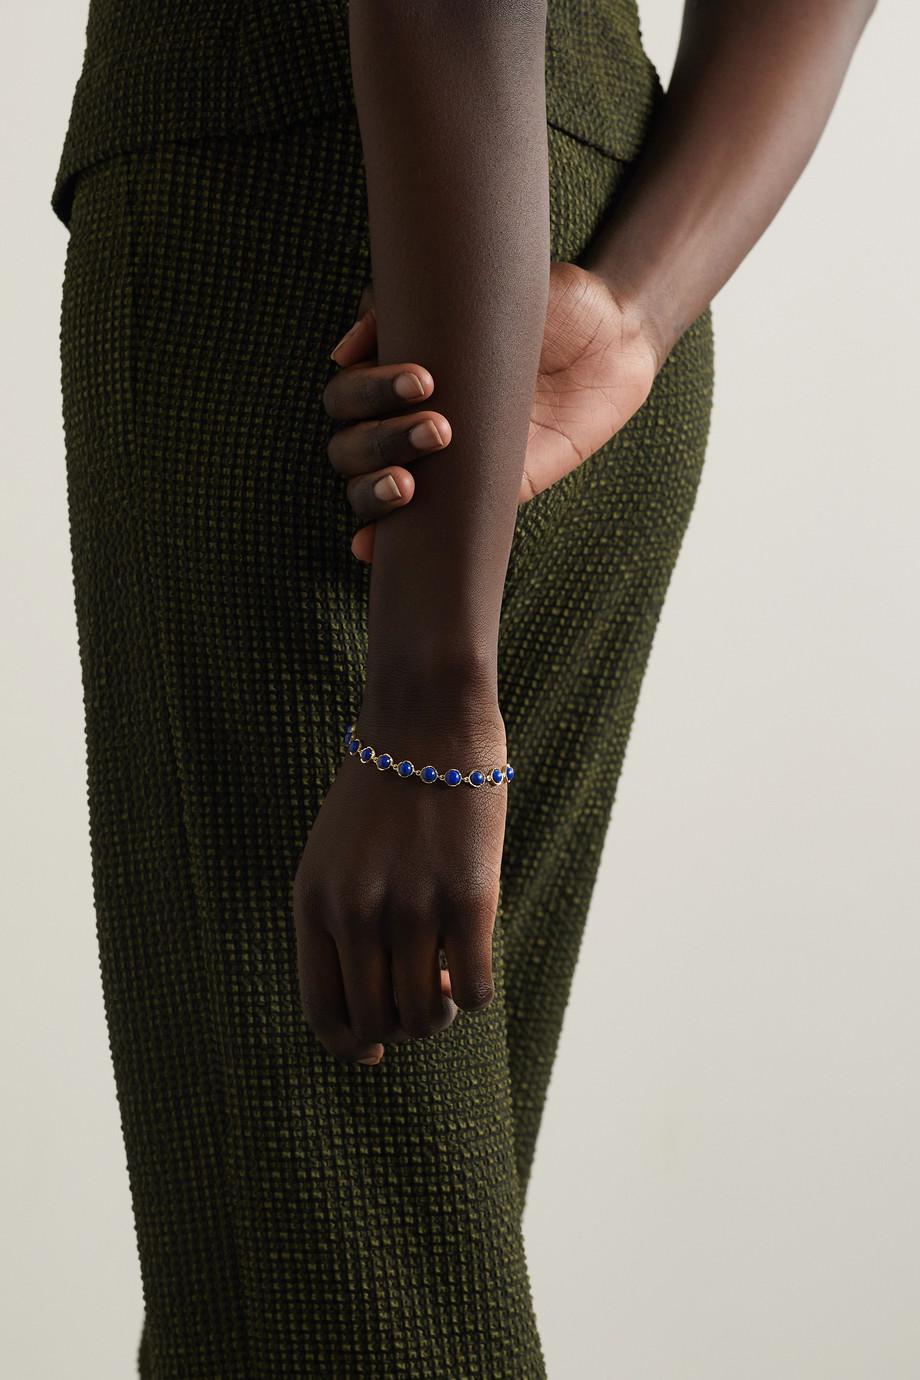 Irene Neuwirth Classic Armband aus 18 Karat Gold mit Lapislazuli